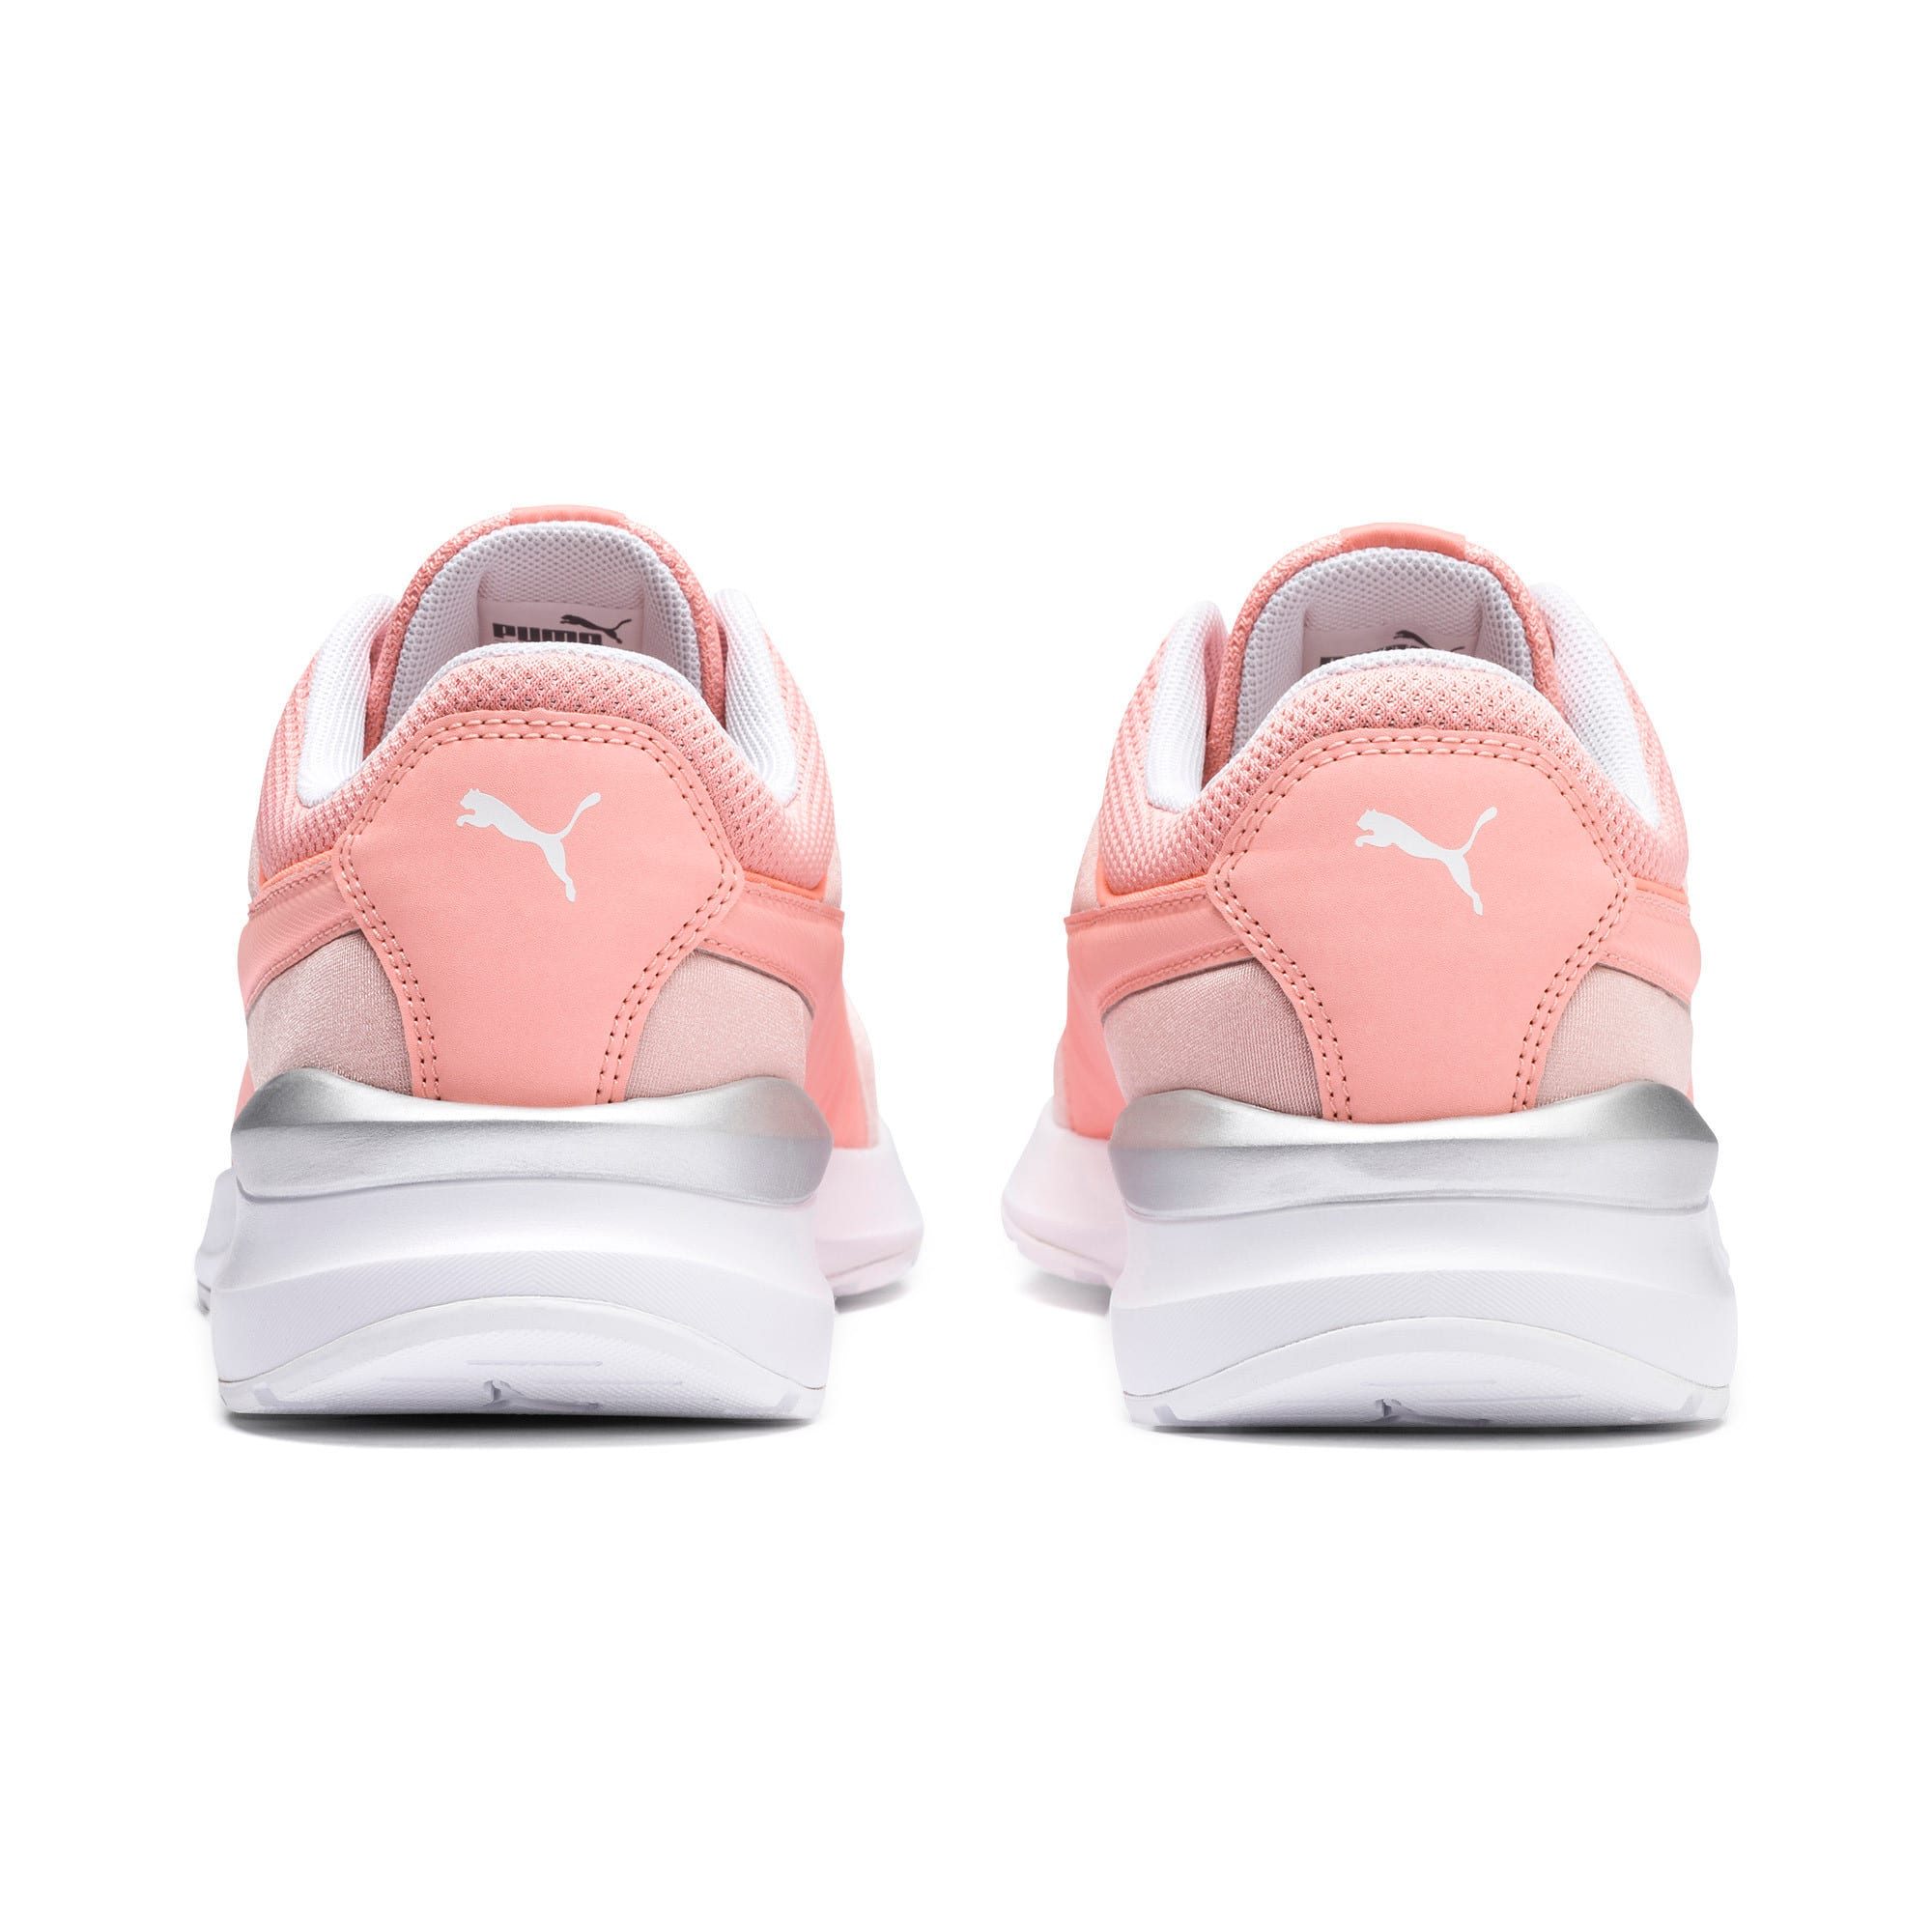 Thumbnail 4 of Adela Women's Sneakers, Peach Bud-Peach Bud, medium